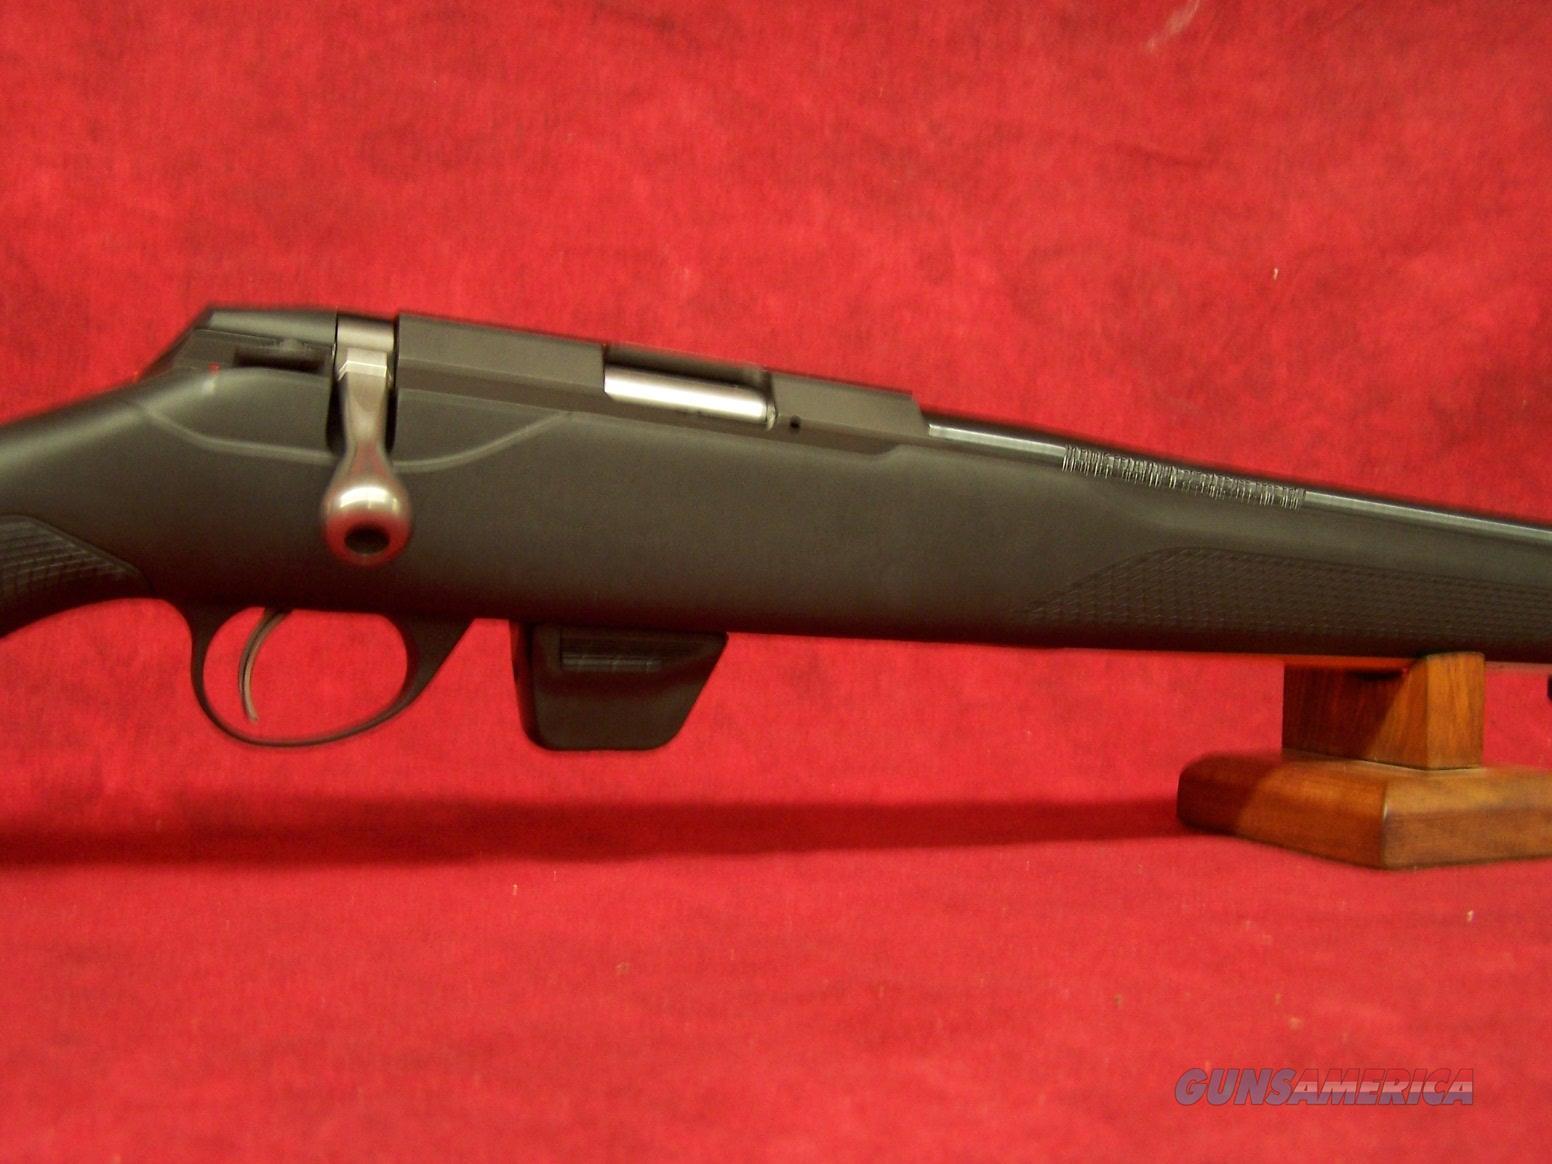 "Tikka T1x .22LR 20"" Barrel (JRT1X300)  Guns > Rifles > Tikka Rifles > Other"